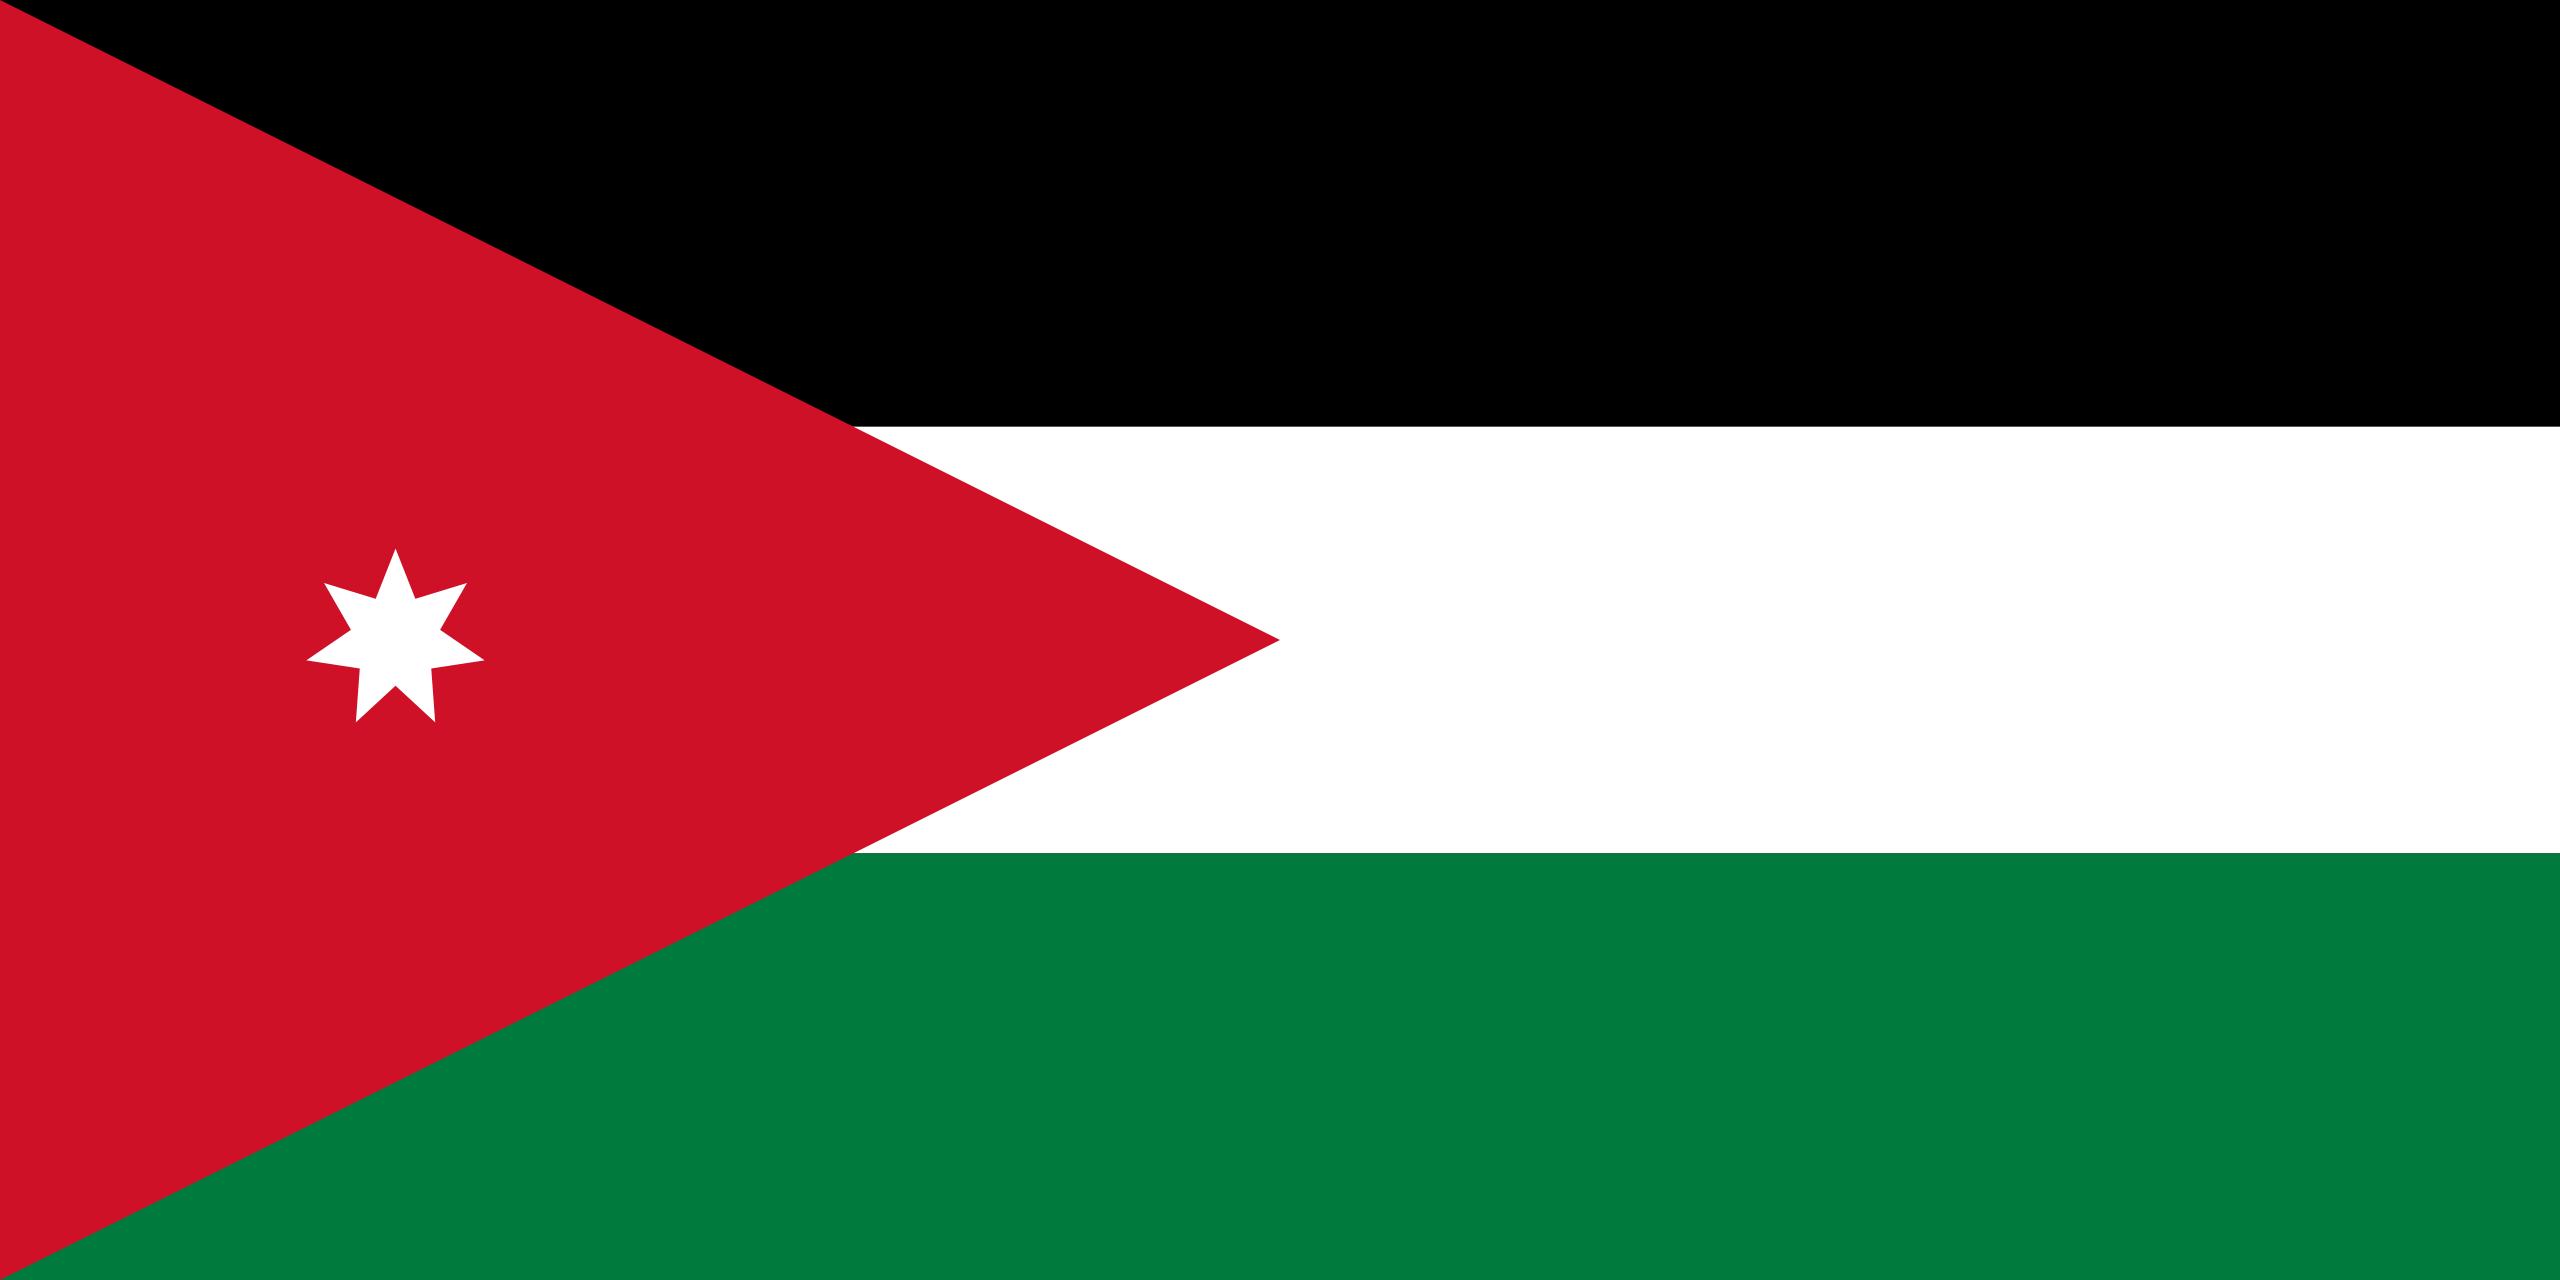 Giordania, paese, emblema, logo, simbolo - Sfondi HD - Professor-falken.com